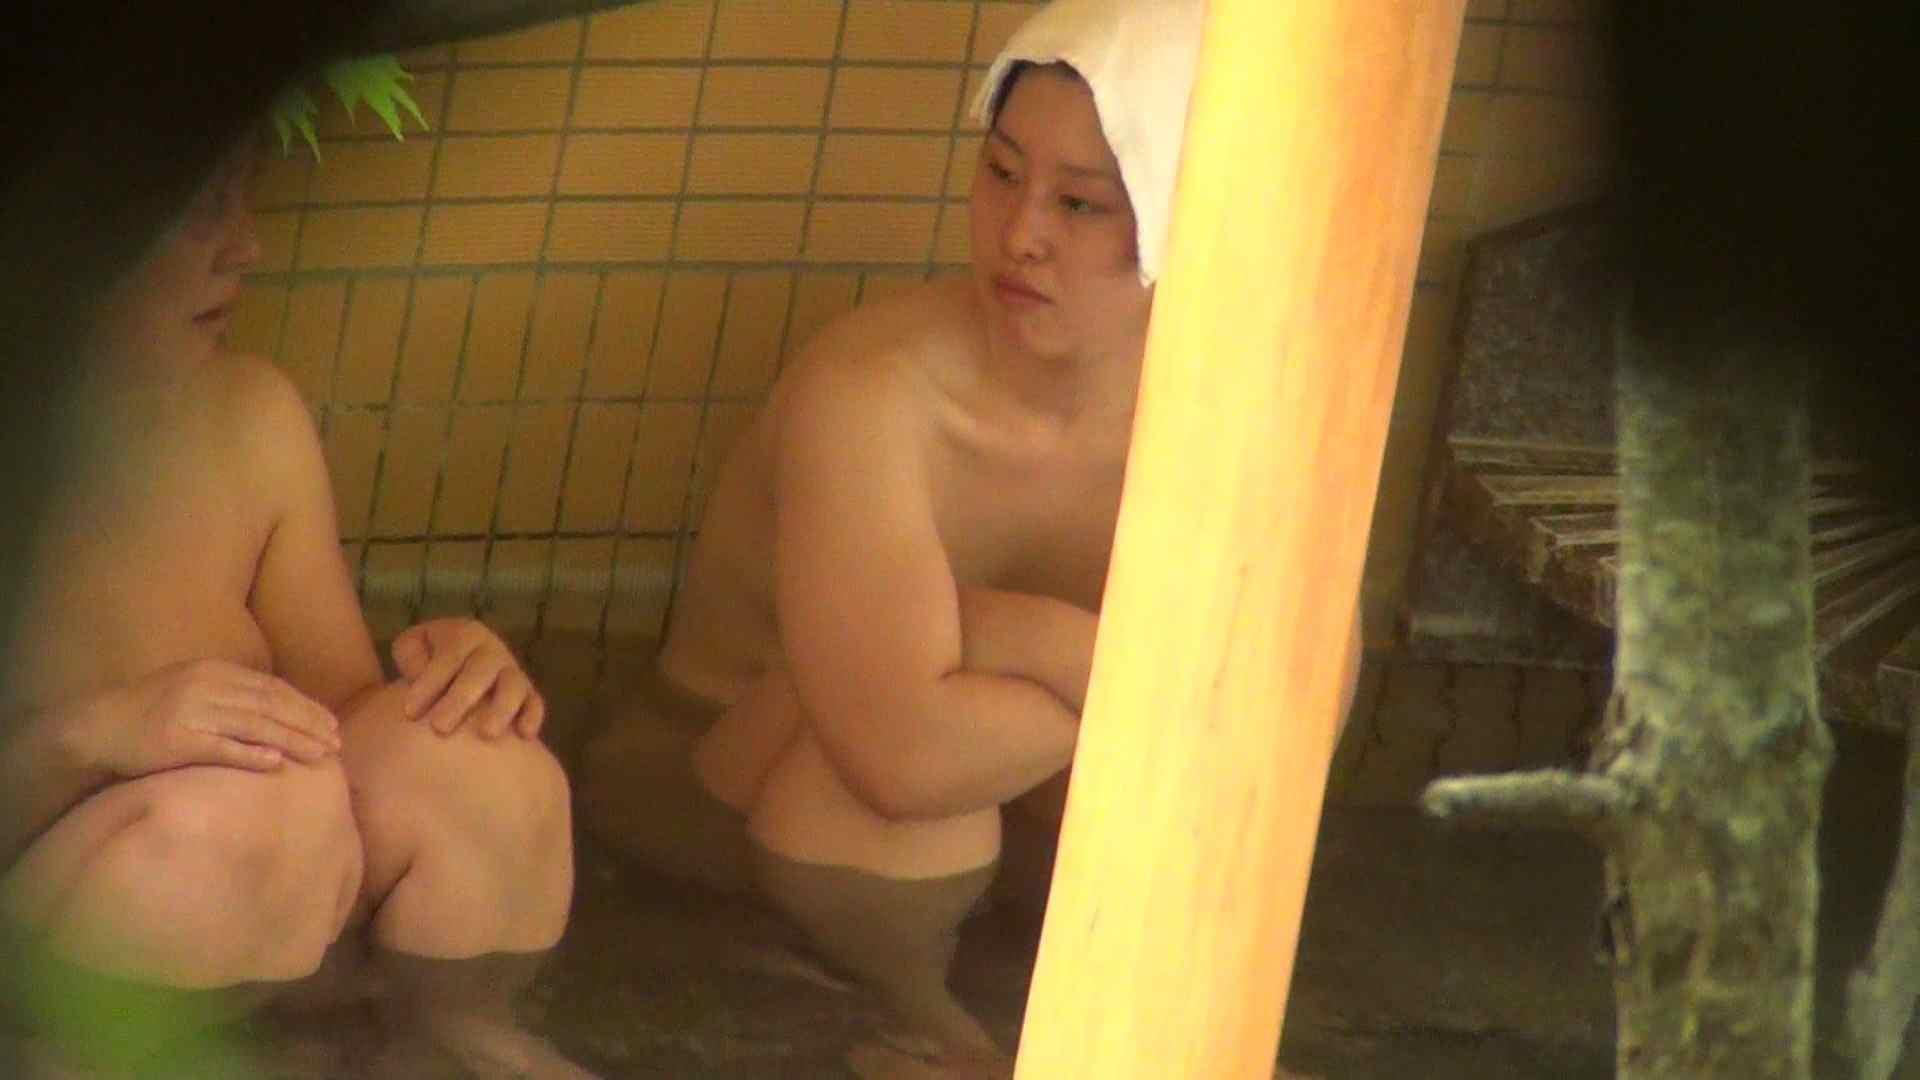 Aquaな露天風呂Vol.264 盗撮師作品 エロ画像 99pic 98